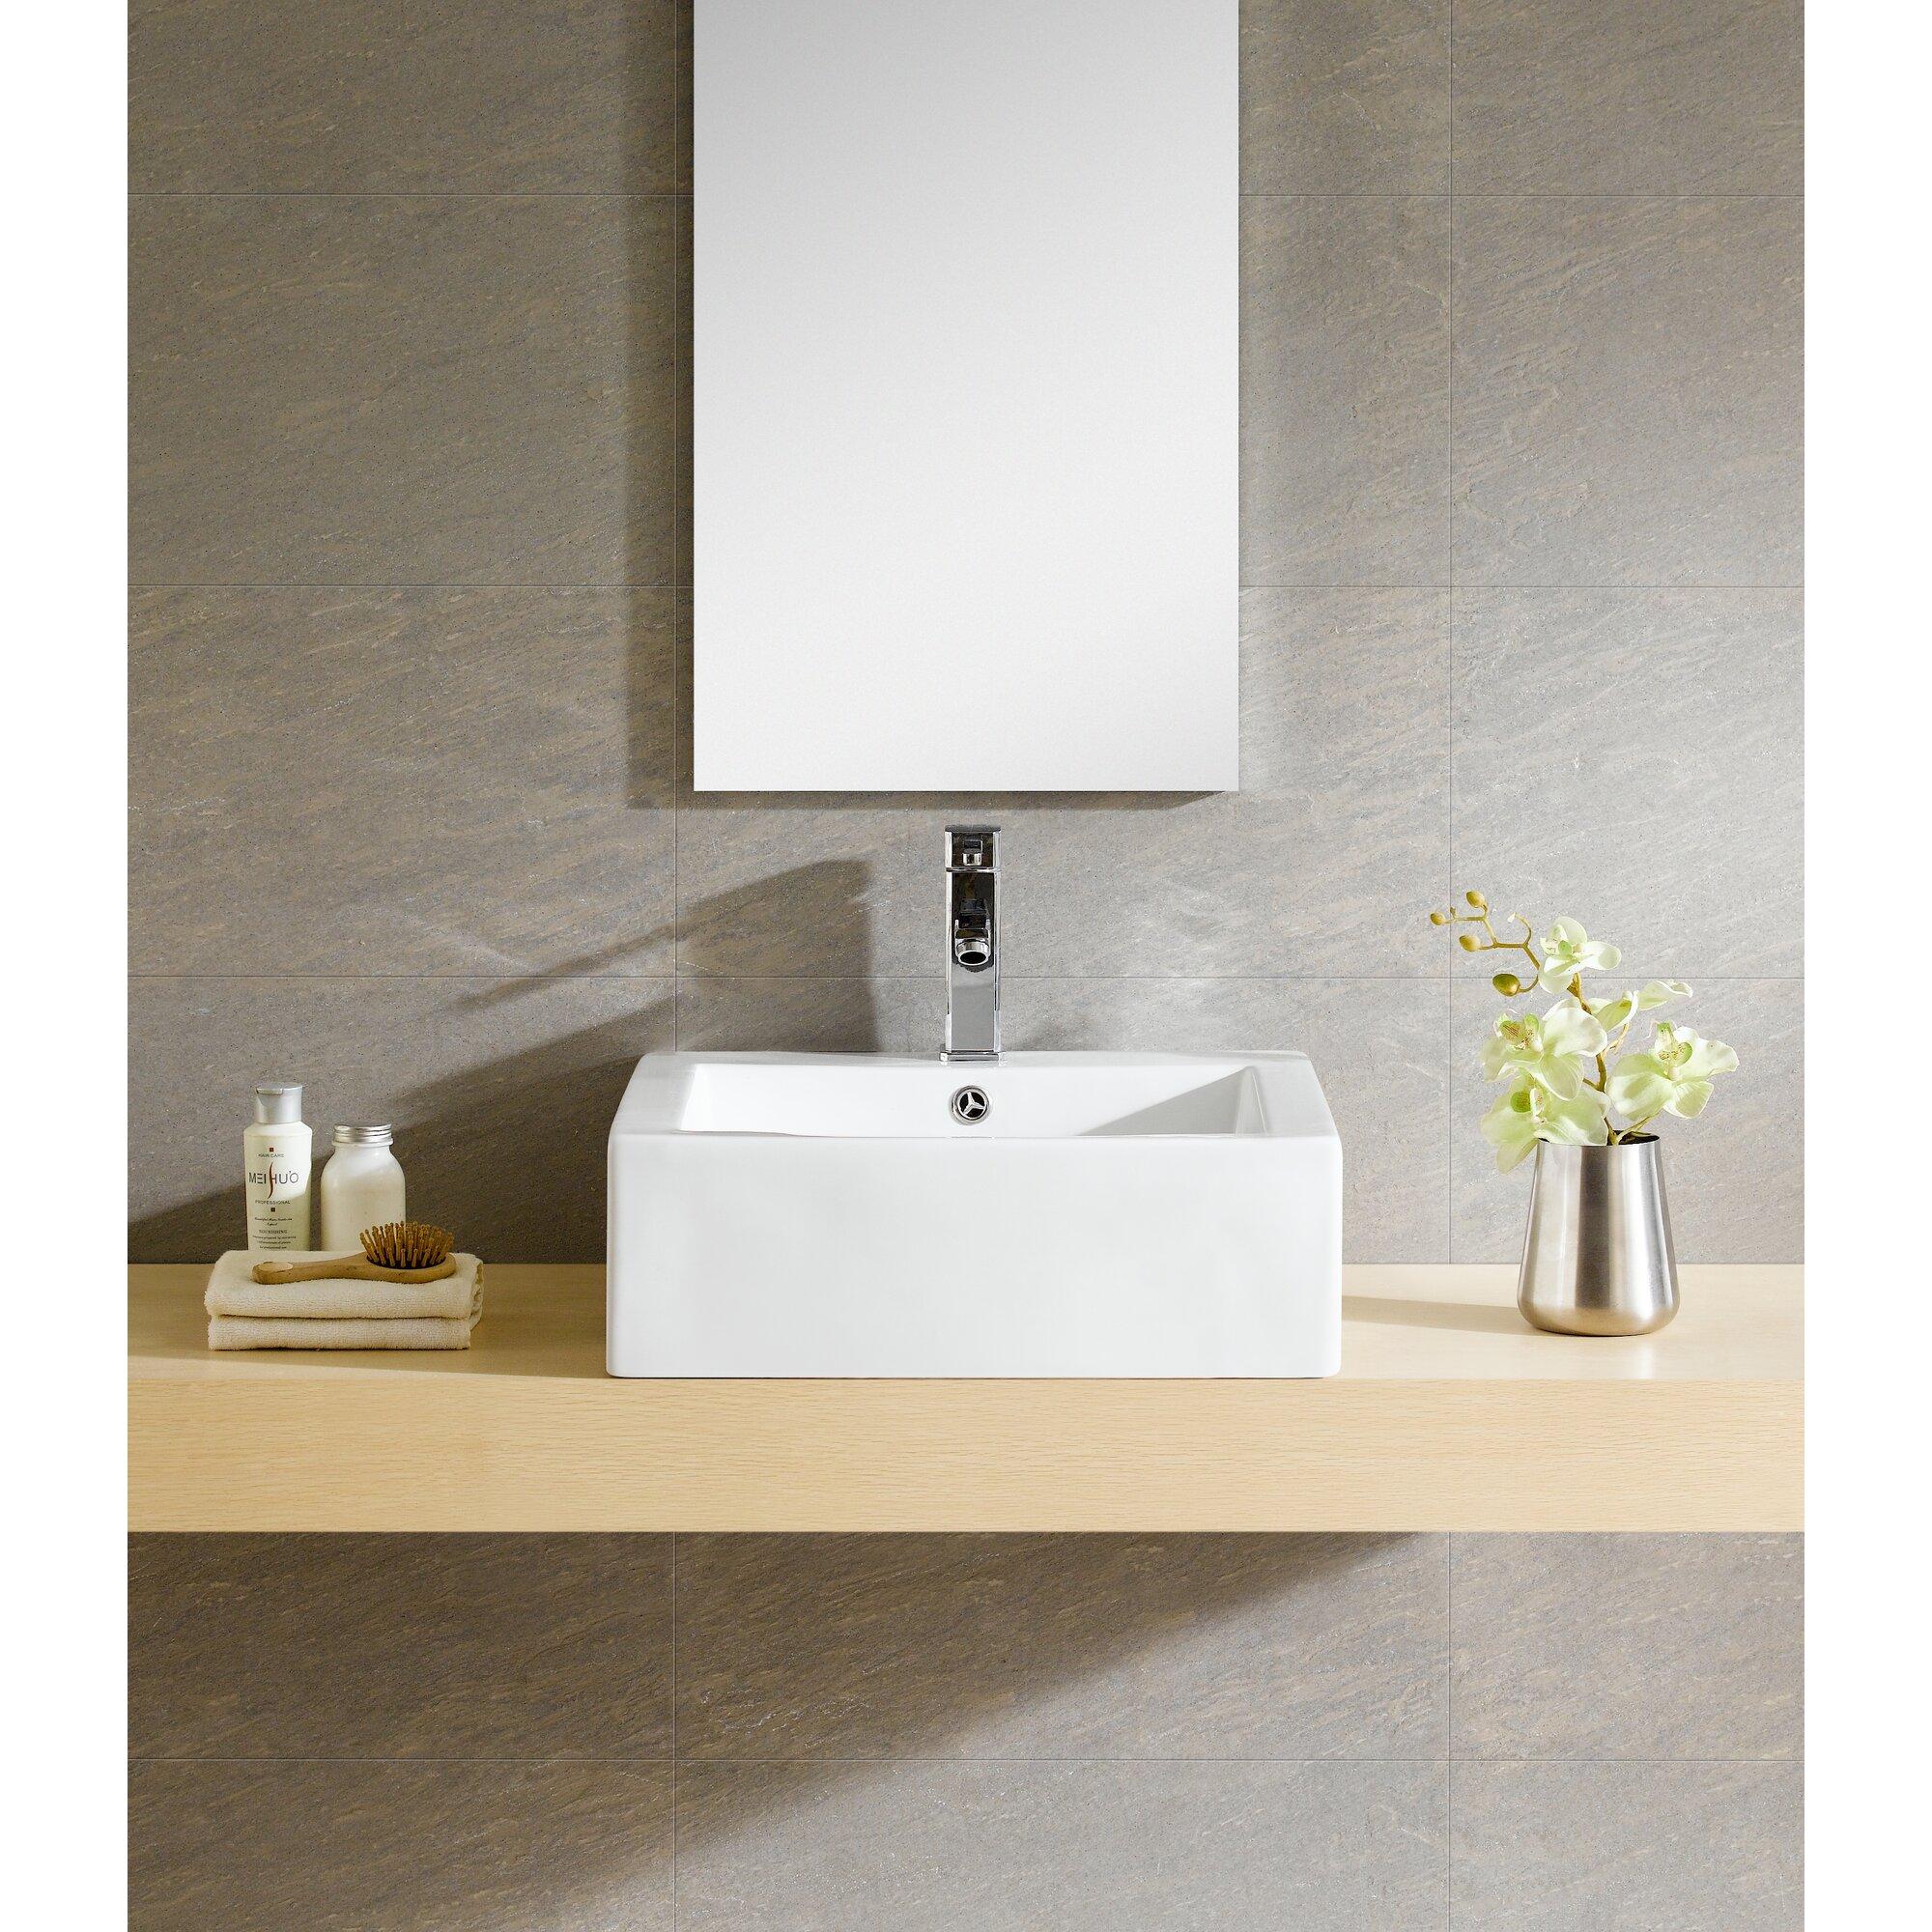 Bathroom square vessel sinks - Modern Vitreous Square Vessel Bathroom Sink